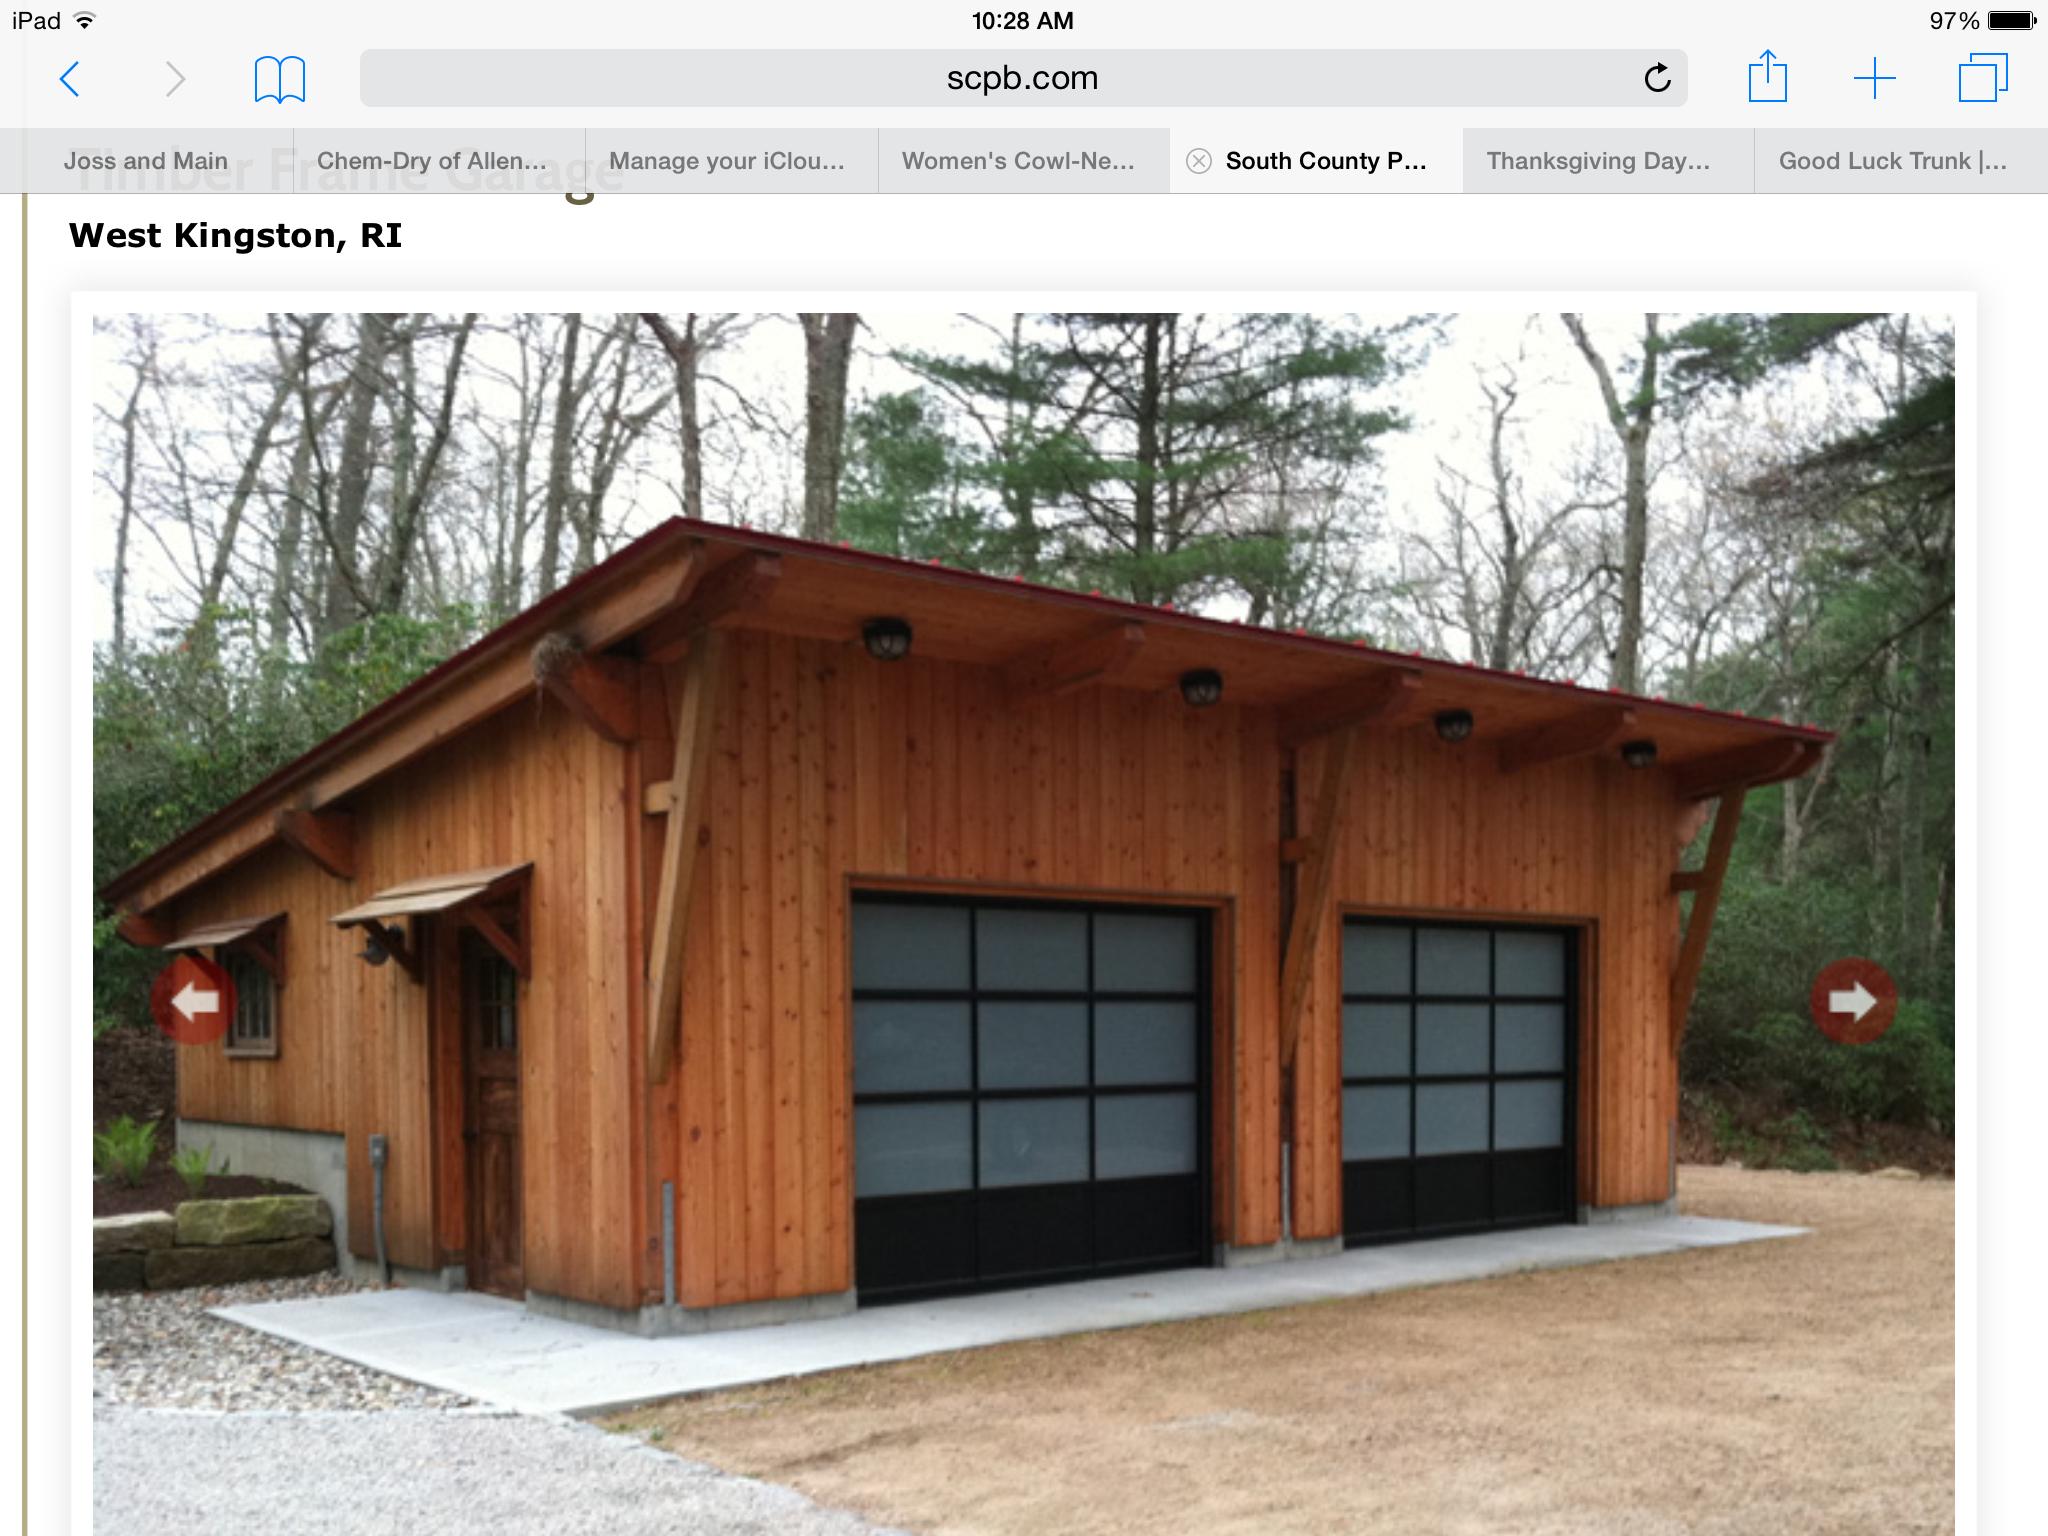 2 Car Detached Garage With Man Cave Above: 40 Best Detached Garage Model For Your Wonderful House